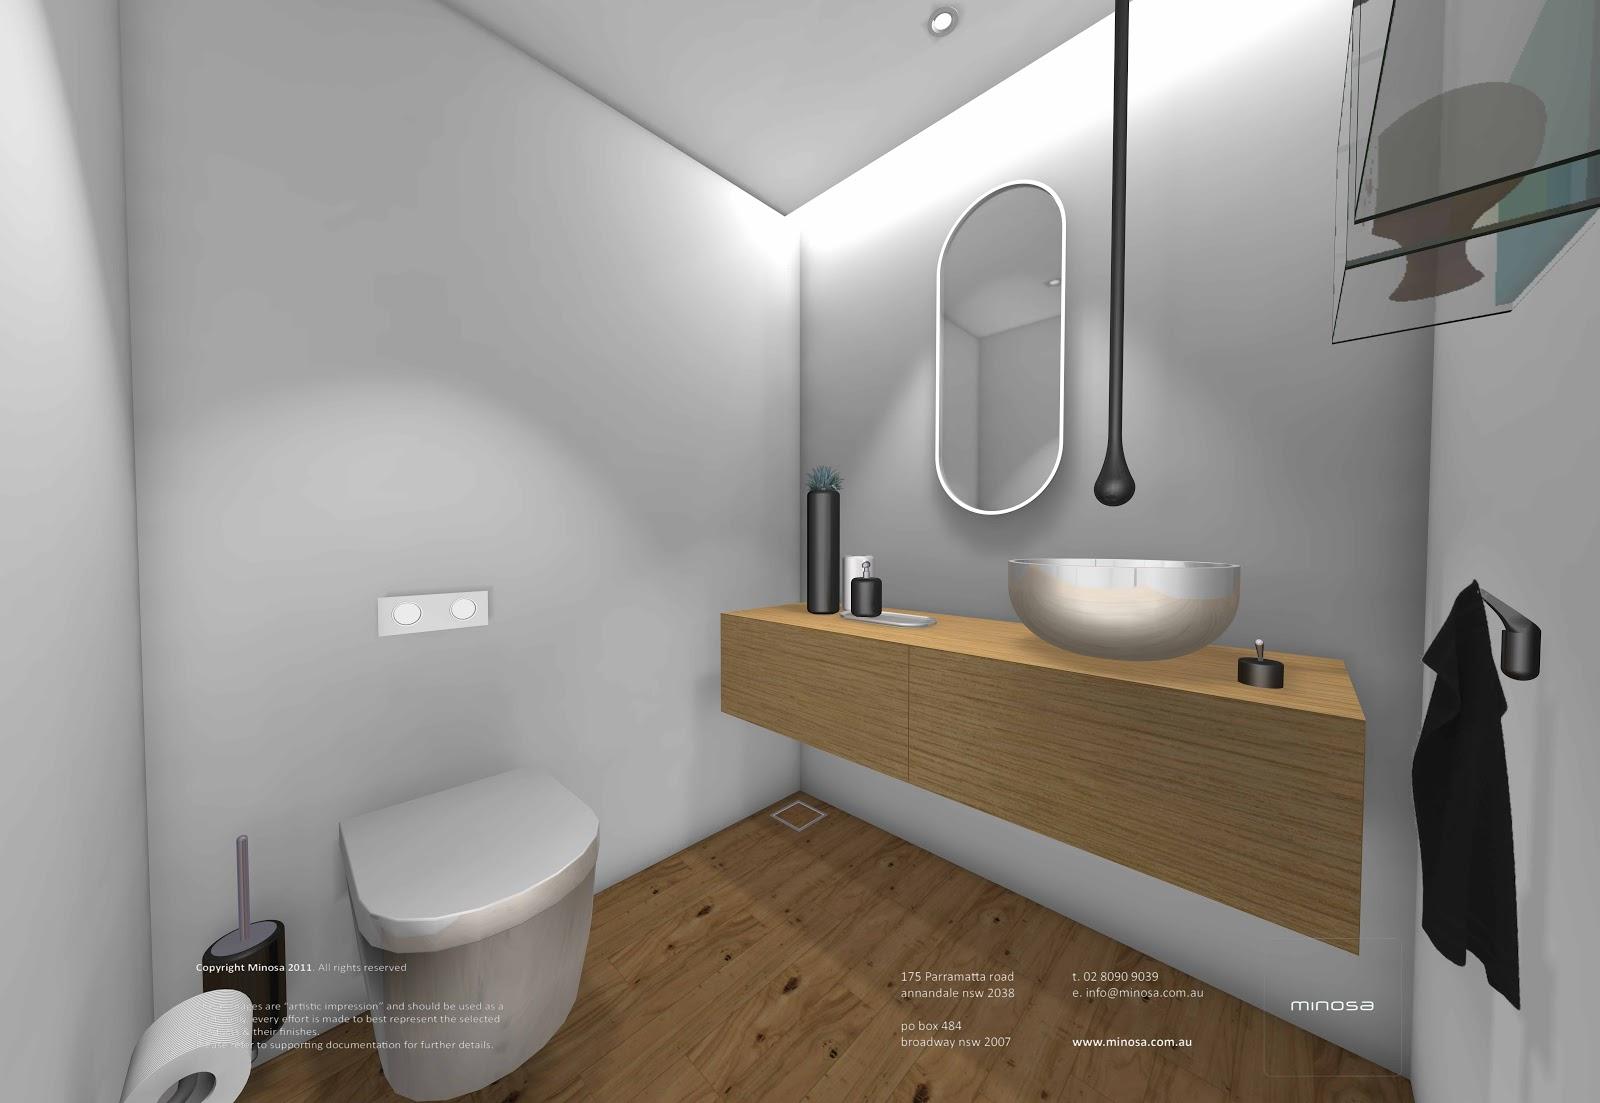 Minosa sydney city apartment modern bathroom design for Bathroom designs sydney